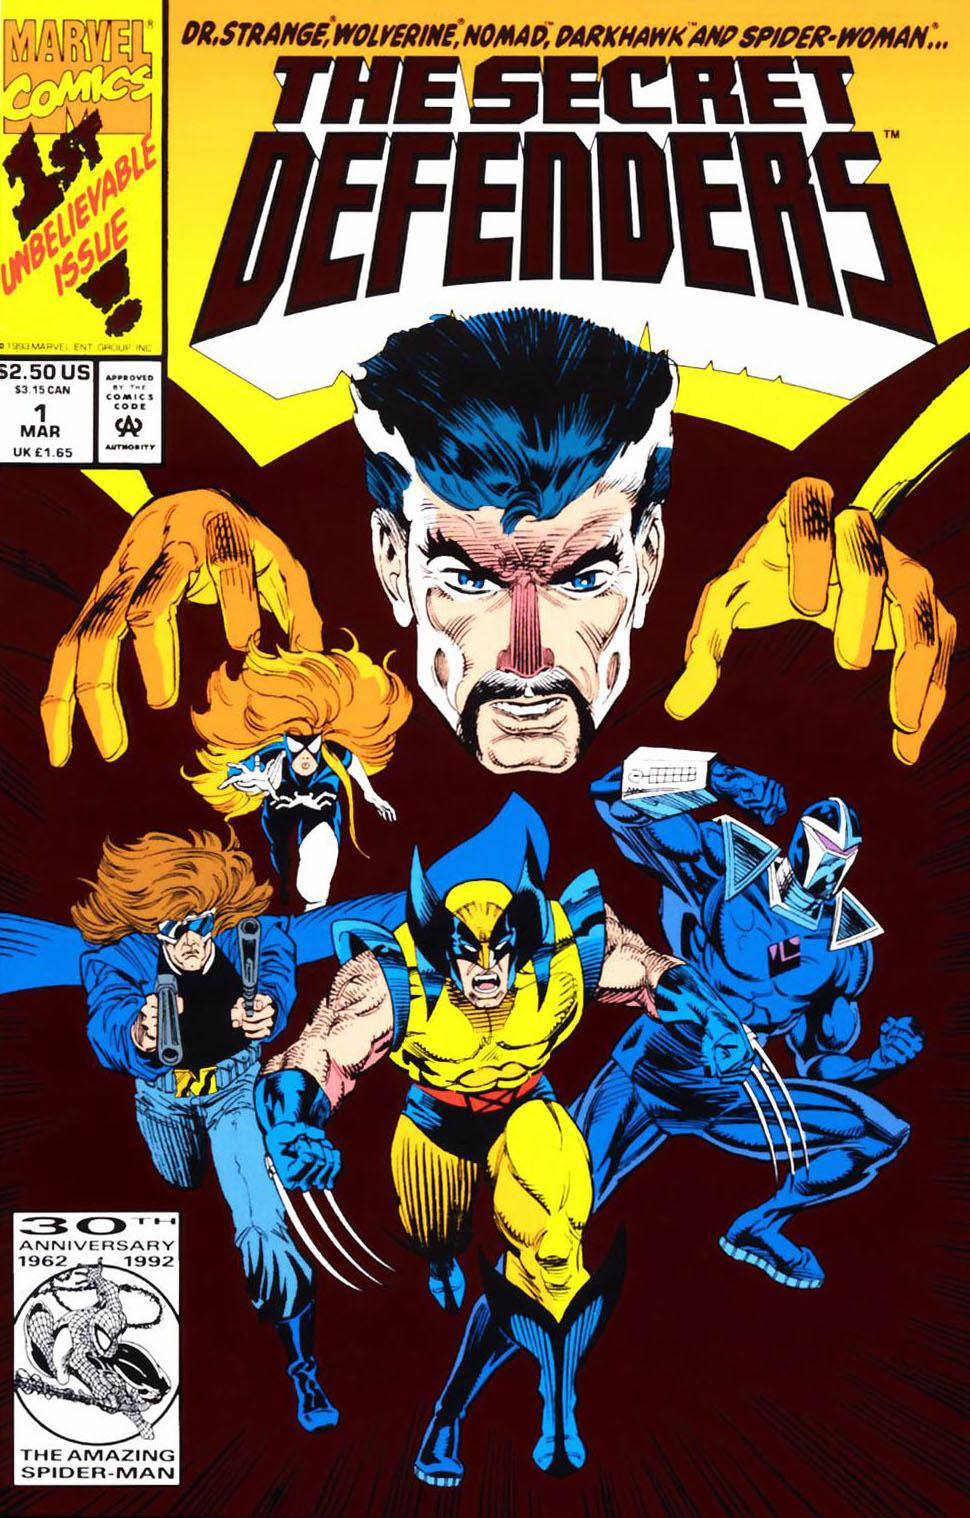 Read online Secret Defenders comic -  Issue #1 - 1